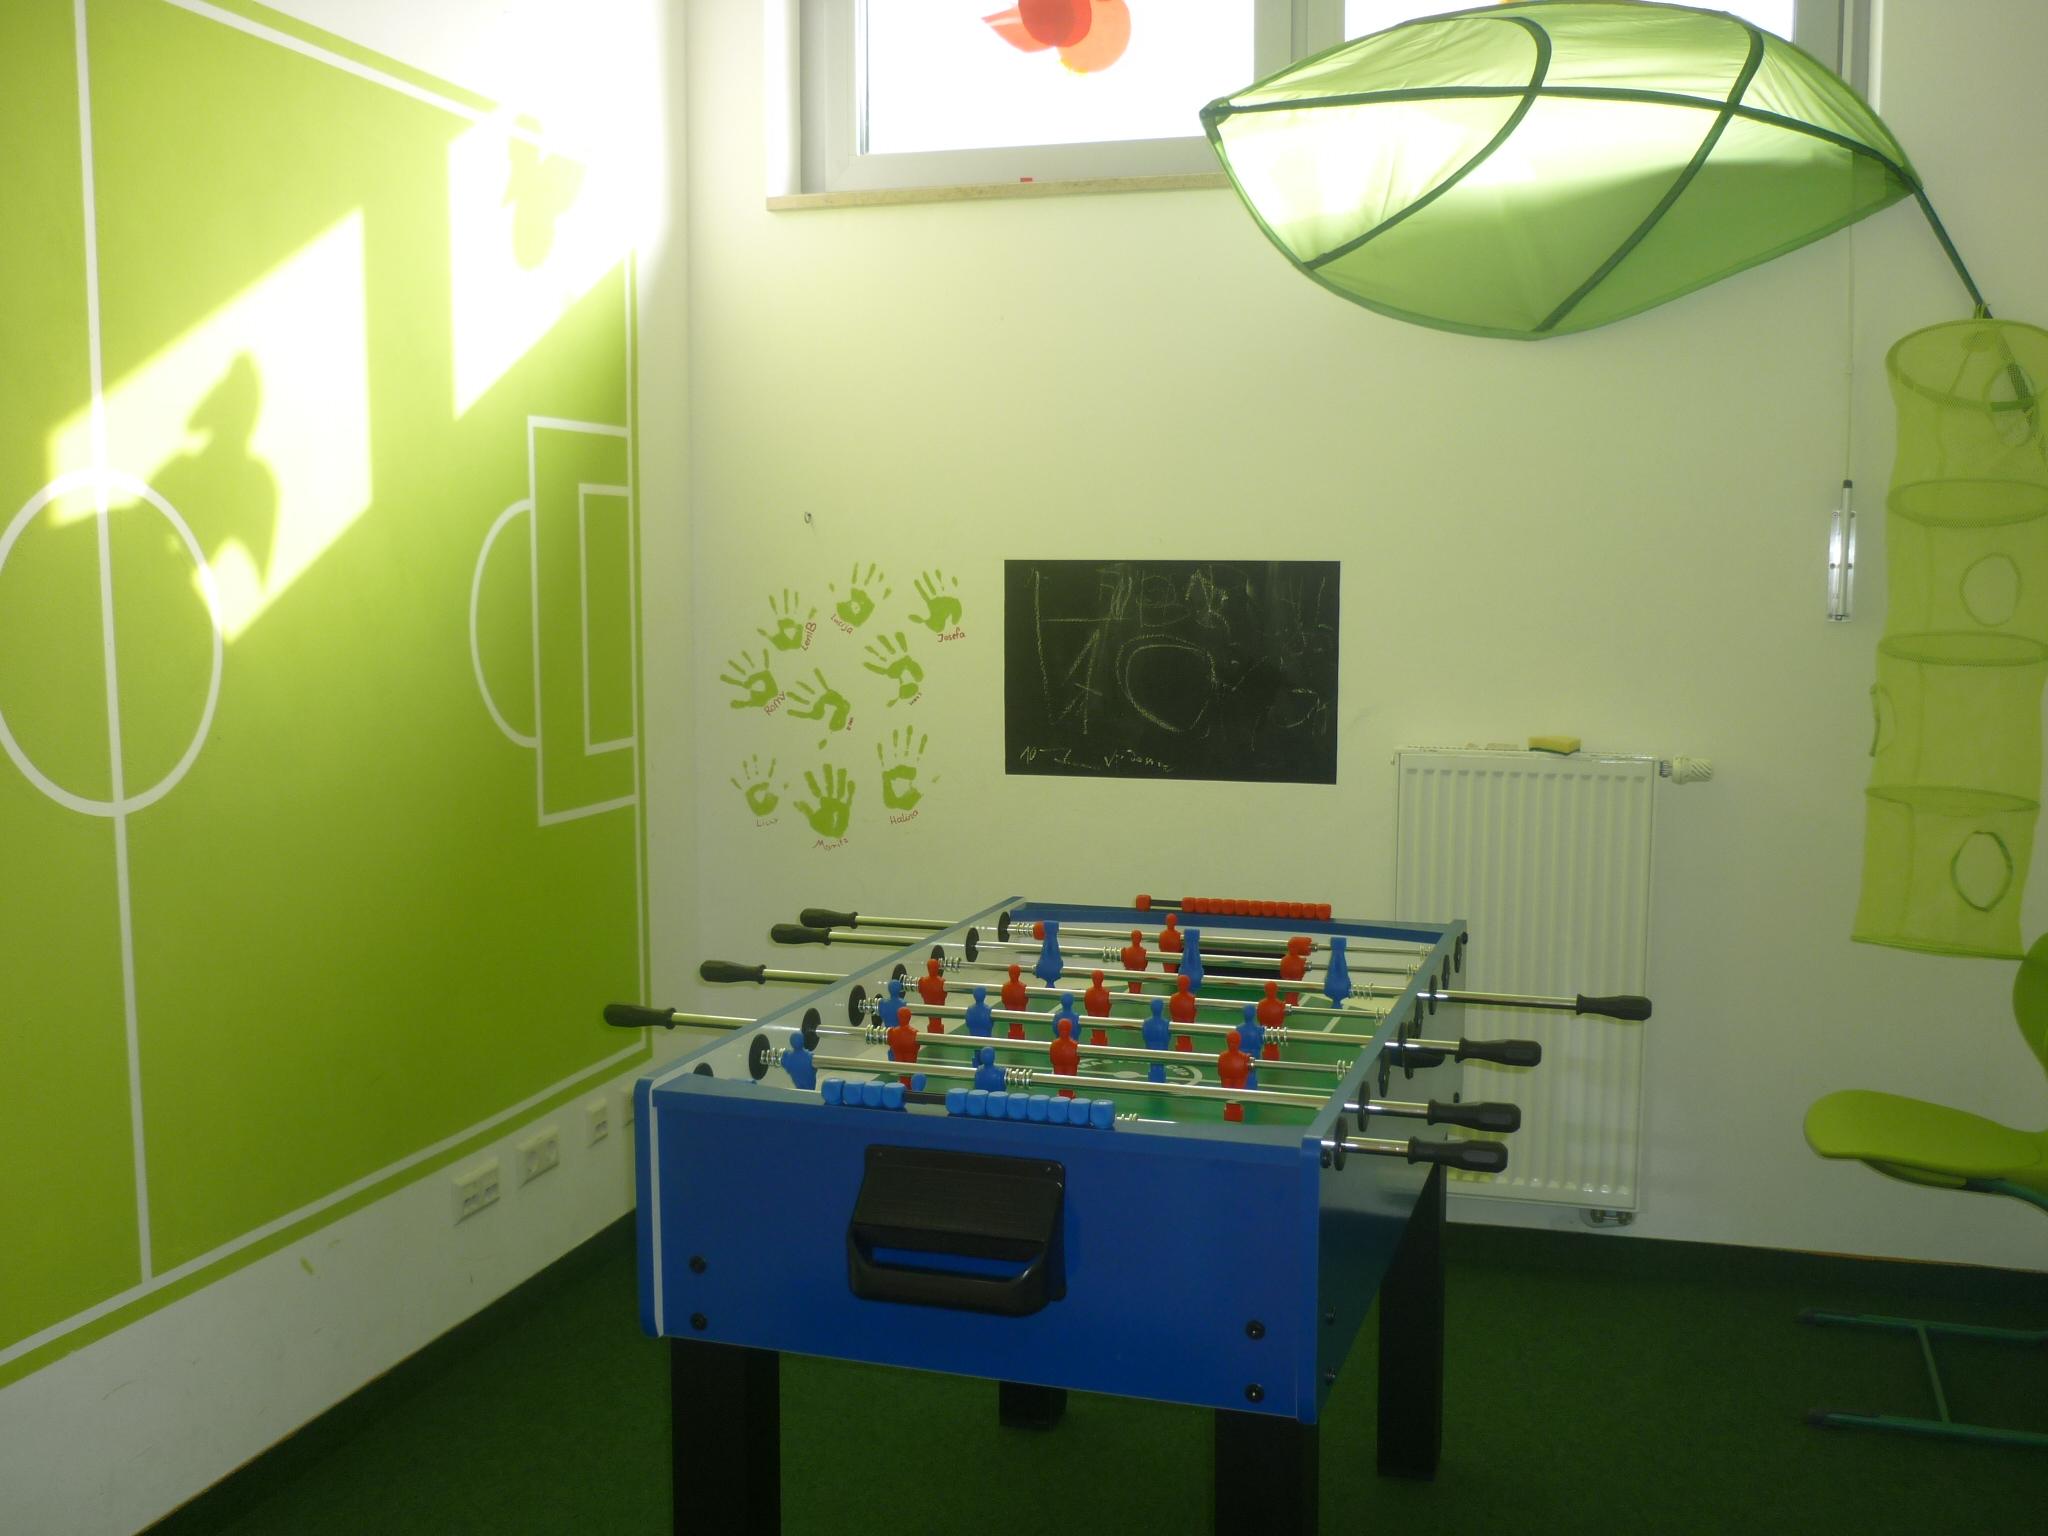 Hvd bayern kindertagesst tten neue raumgestaltung for Raumgestaltung hort